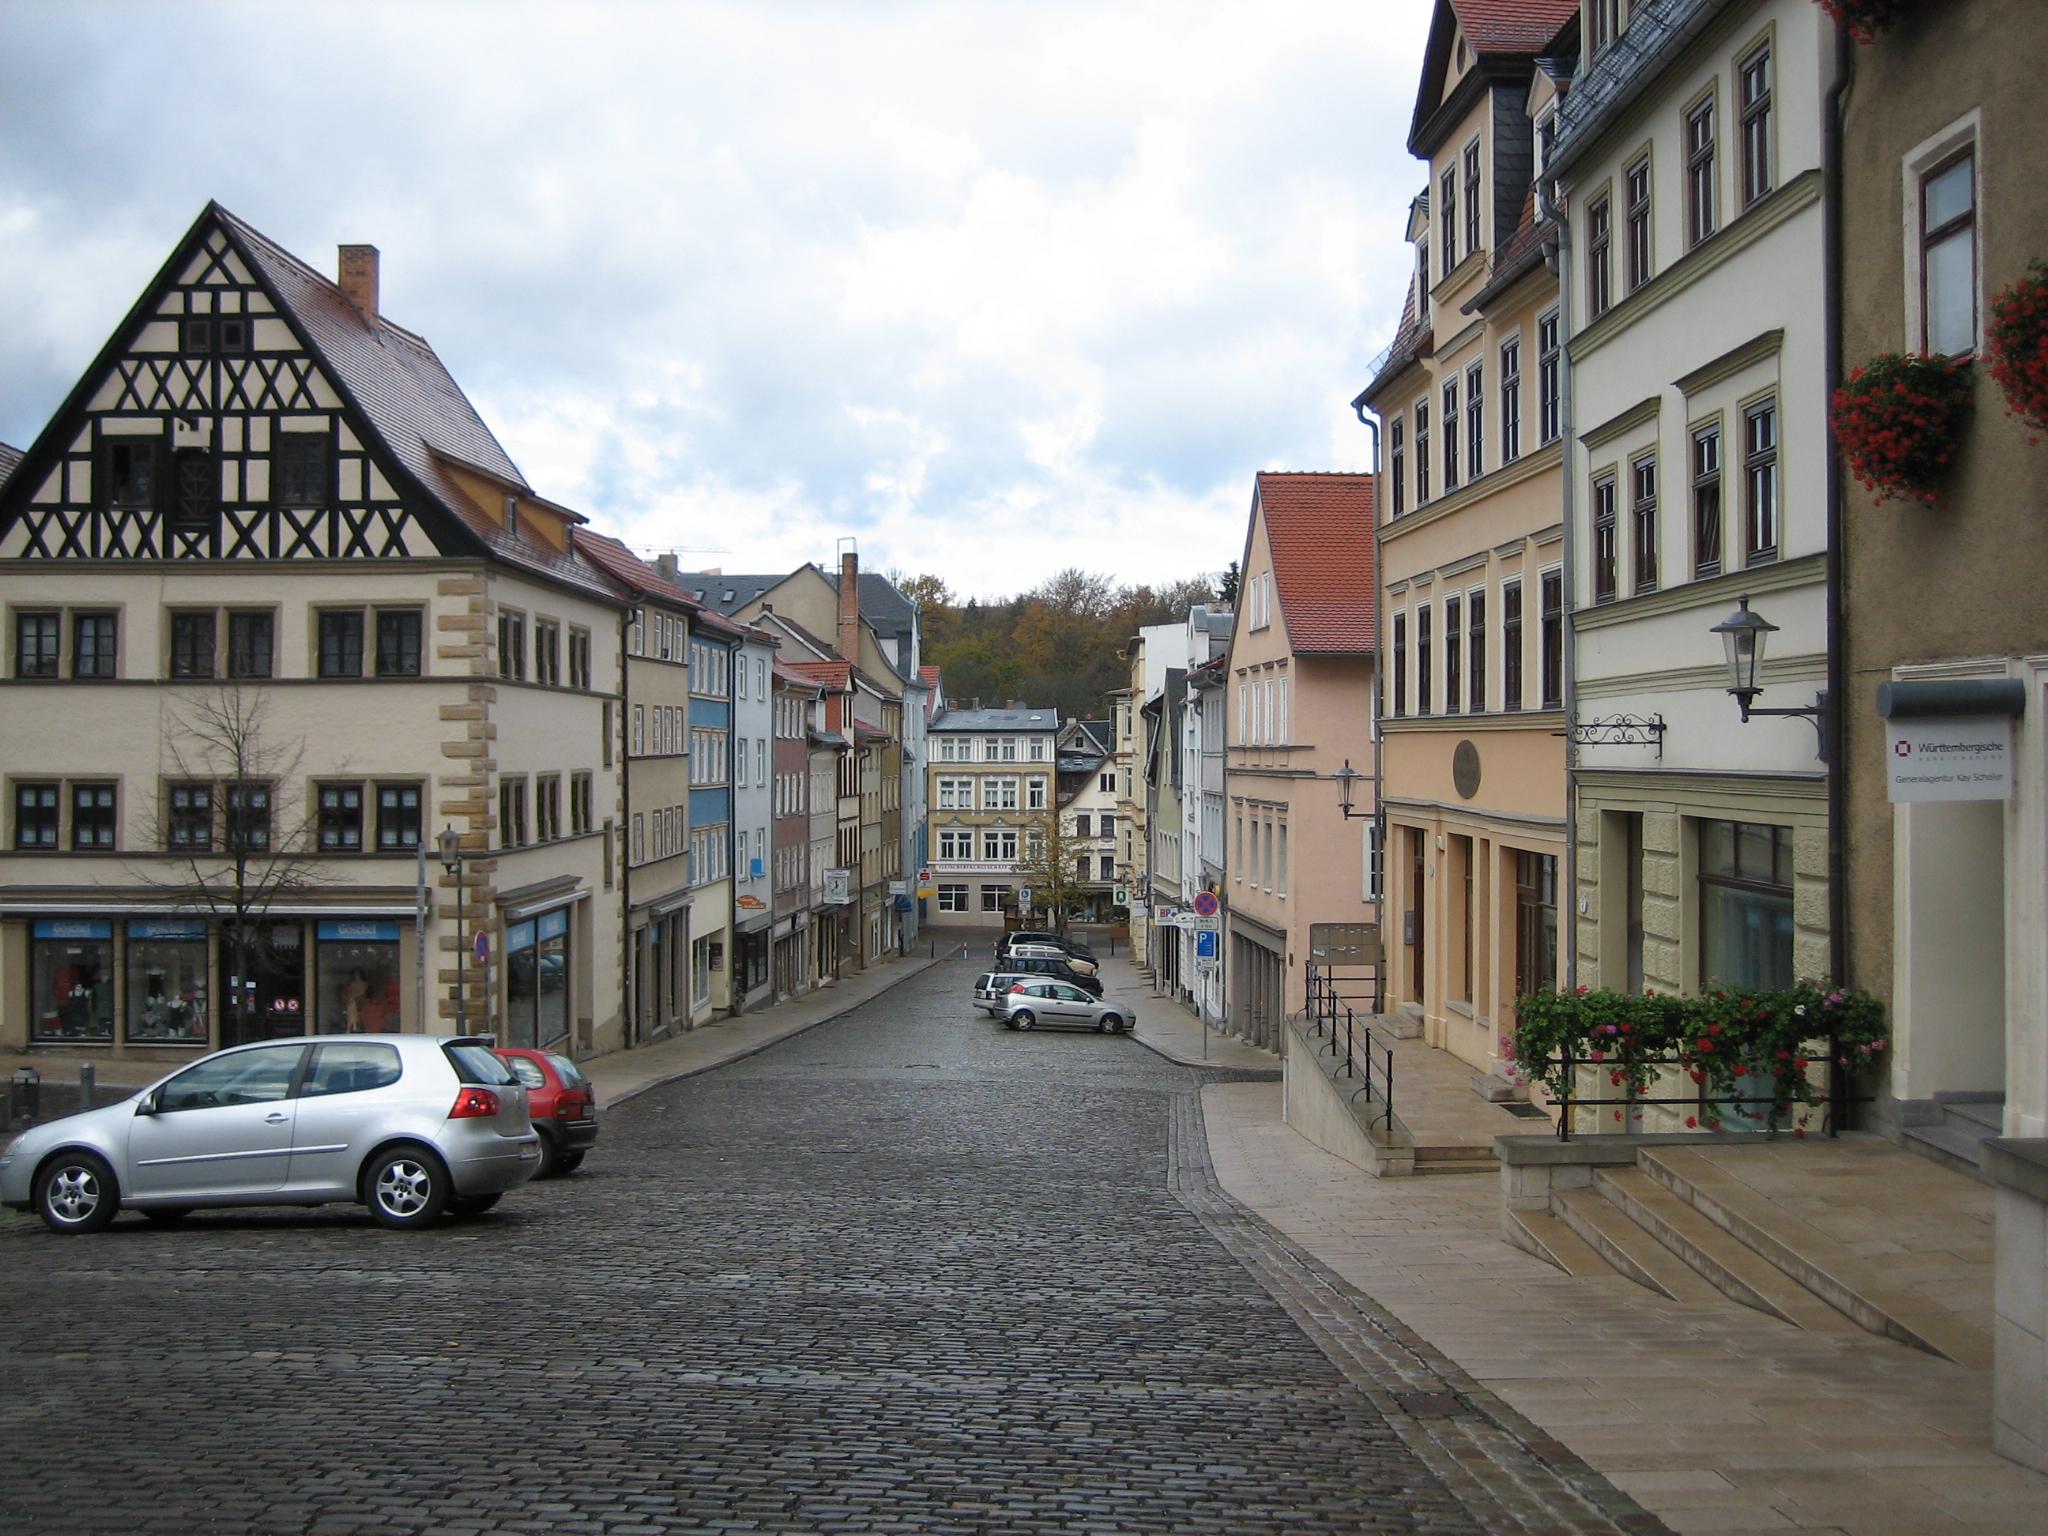 File:Pößneck-Straße im Zentrum.JPG - Wikimedia Commons